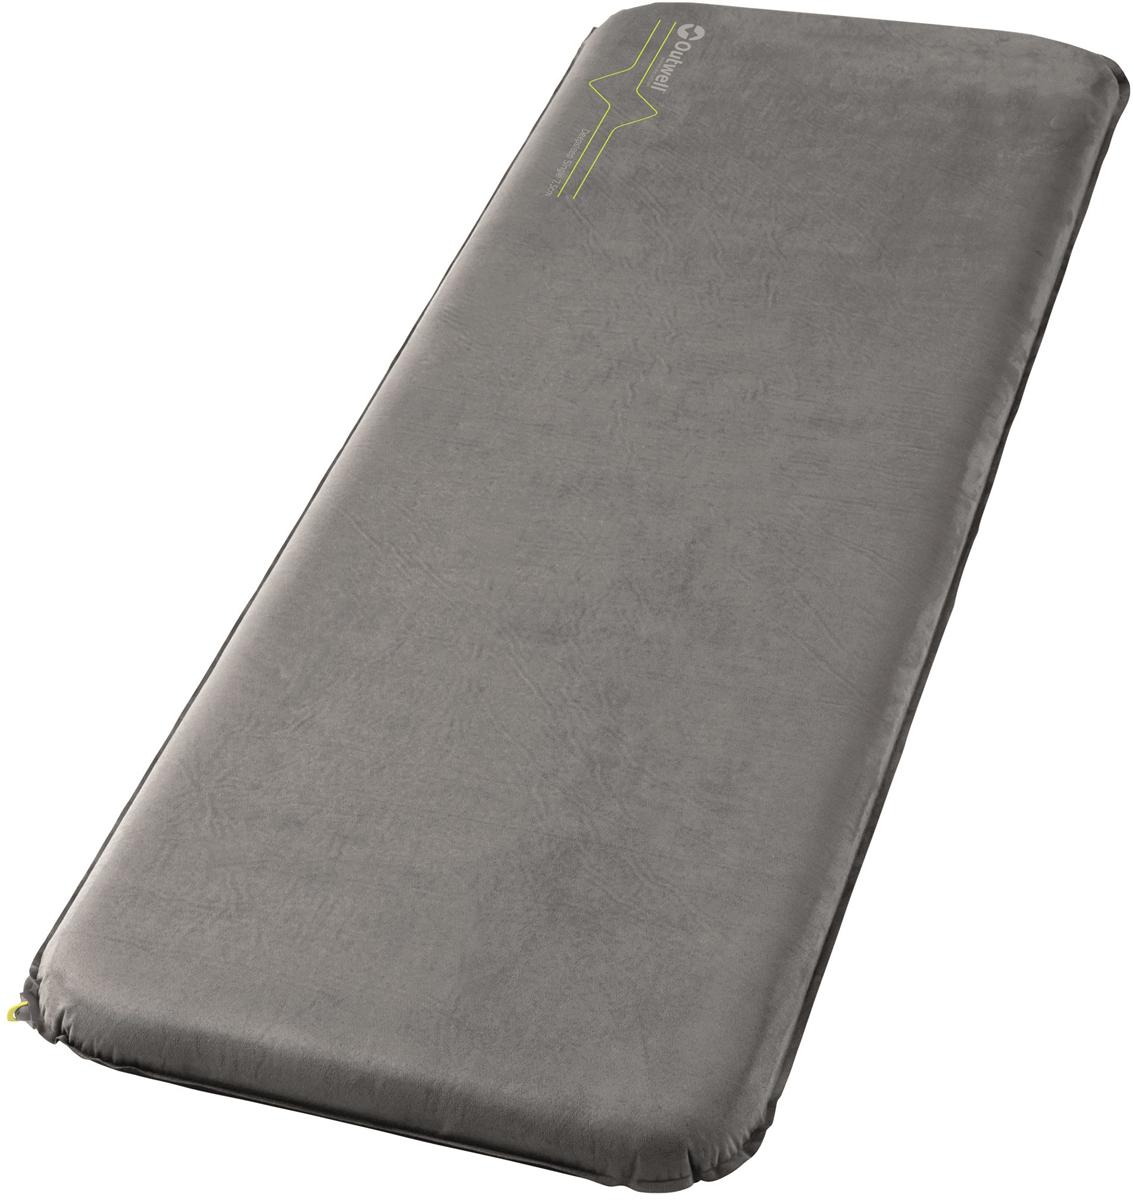 Коврик самонадувающийся Outwell Deepsleep Single, 195 х 63 х 7,5 см кровать надувная outwell reel airbed single 195 х 70 х 9 см